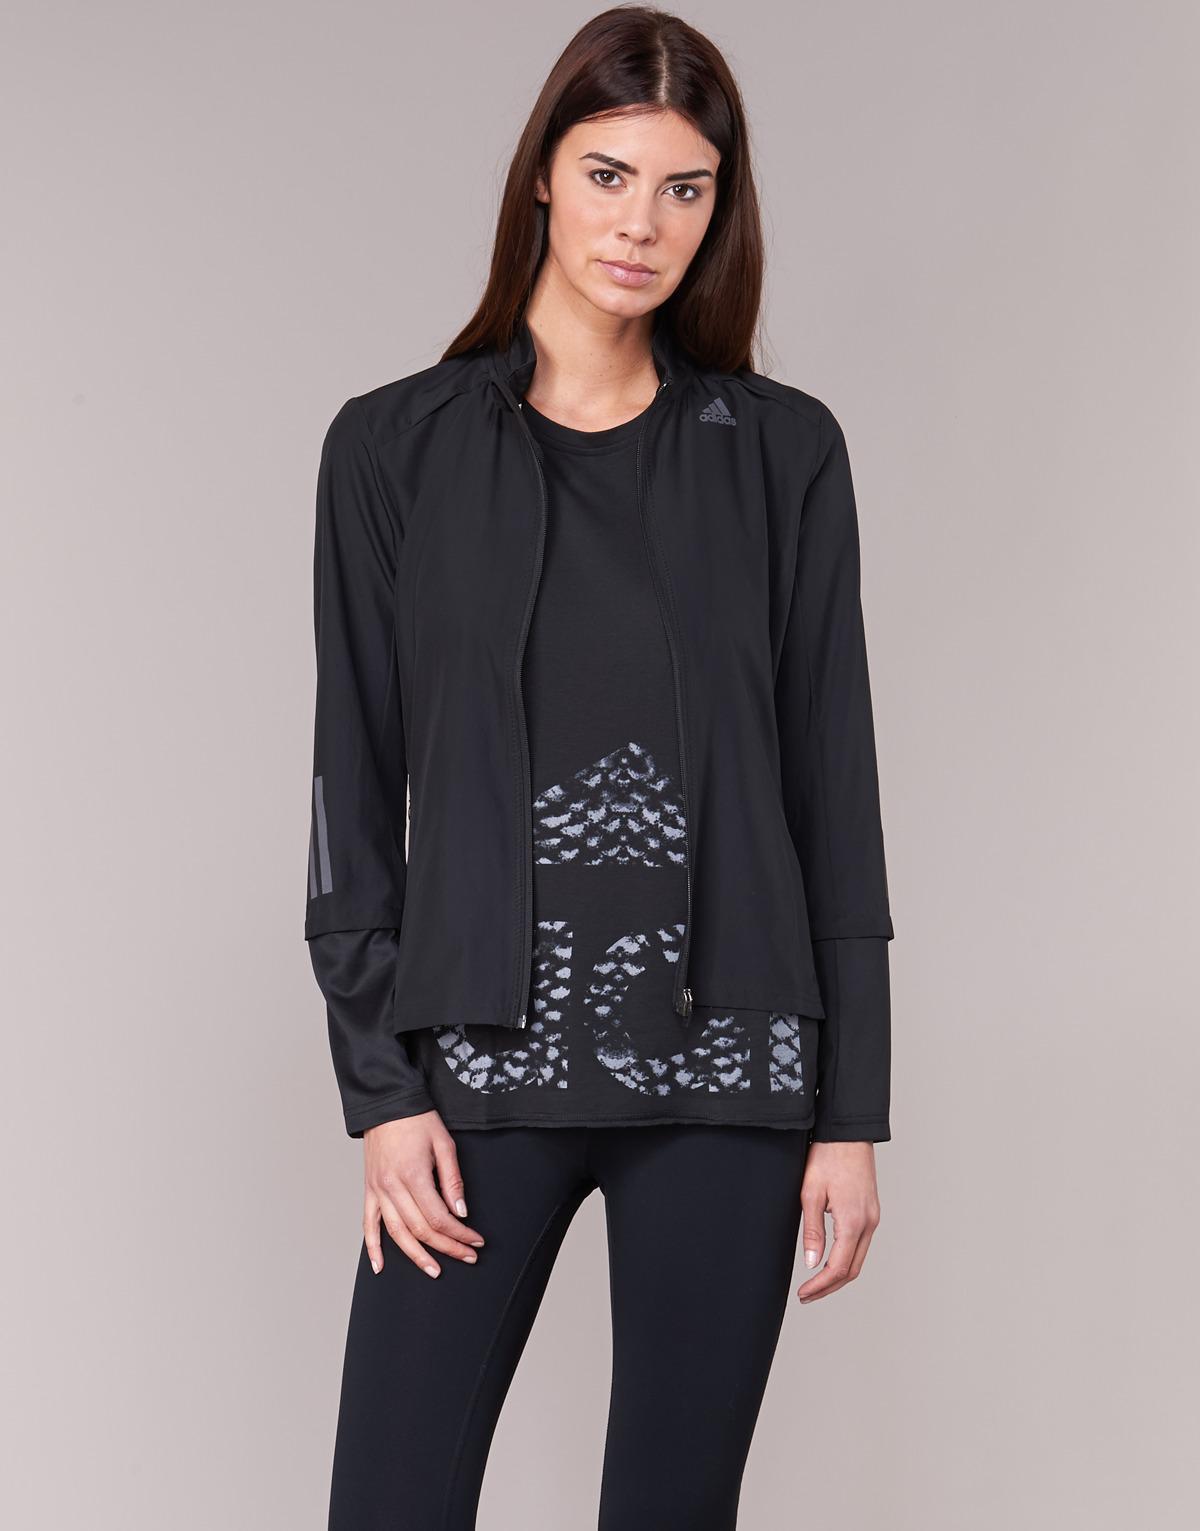 52160d4a5ead Adidas Rs Wind Jkt W Women s Tracksuit Jacket In Black in Black - Save  23.728813559322035% - Lyst